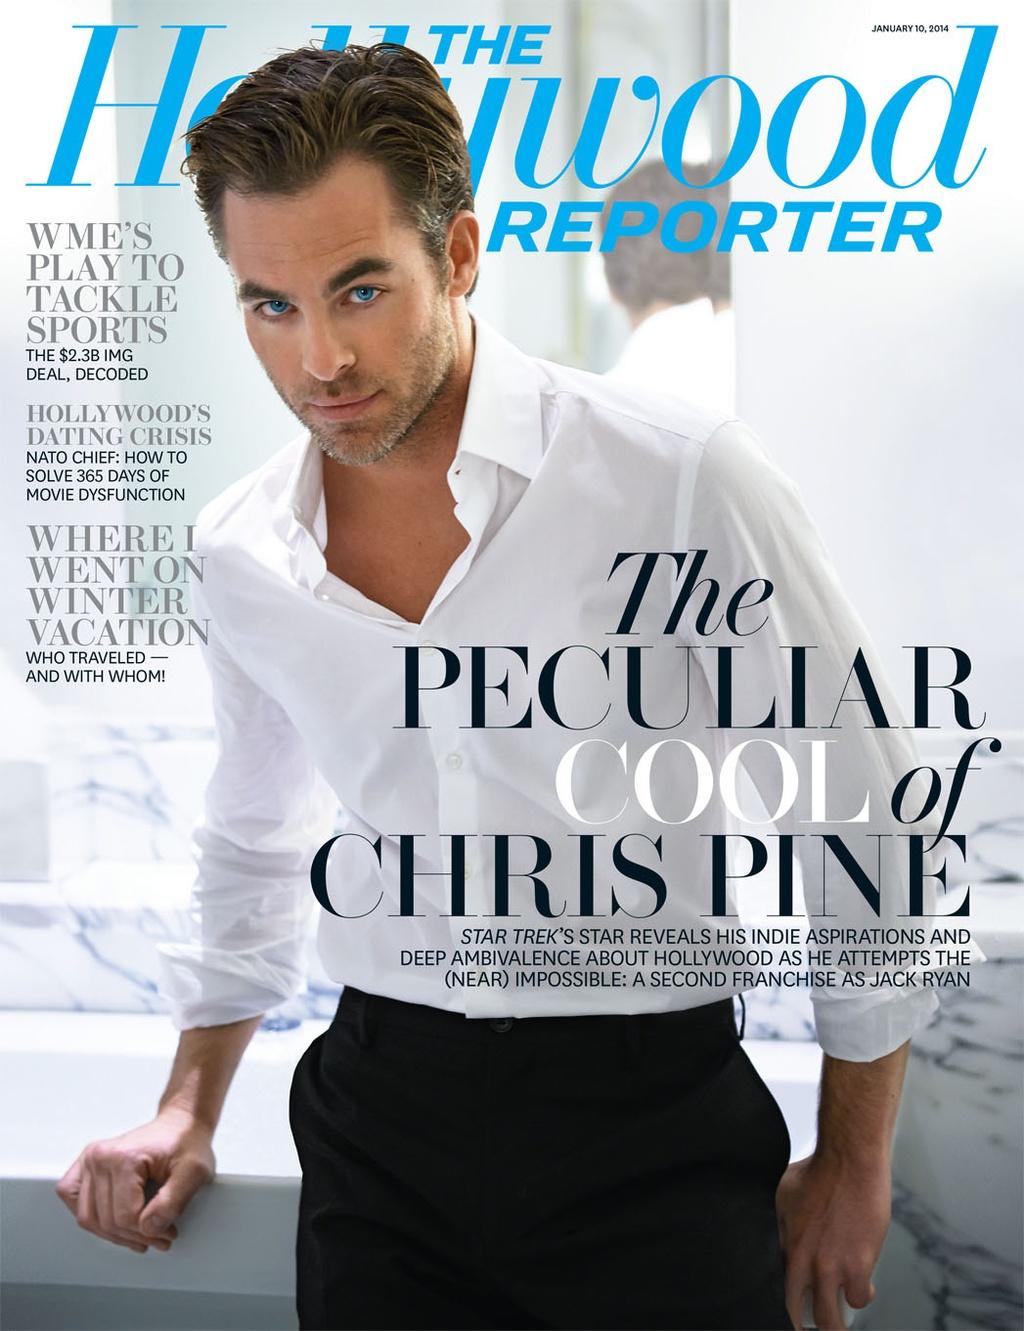 Chris Pine, nguoi dan ong khien trai tim 'Wonder Woman' tan chay hinh anh 16